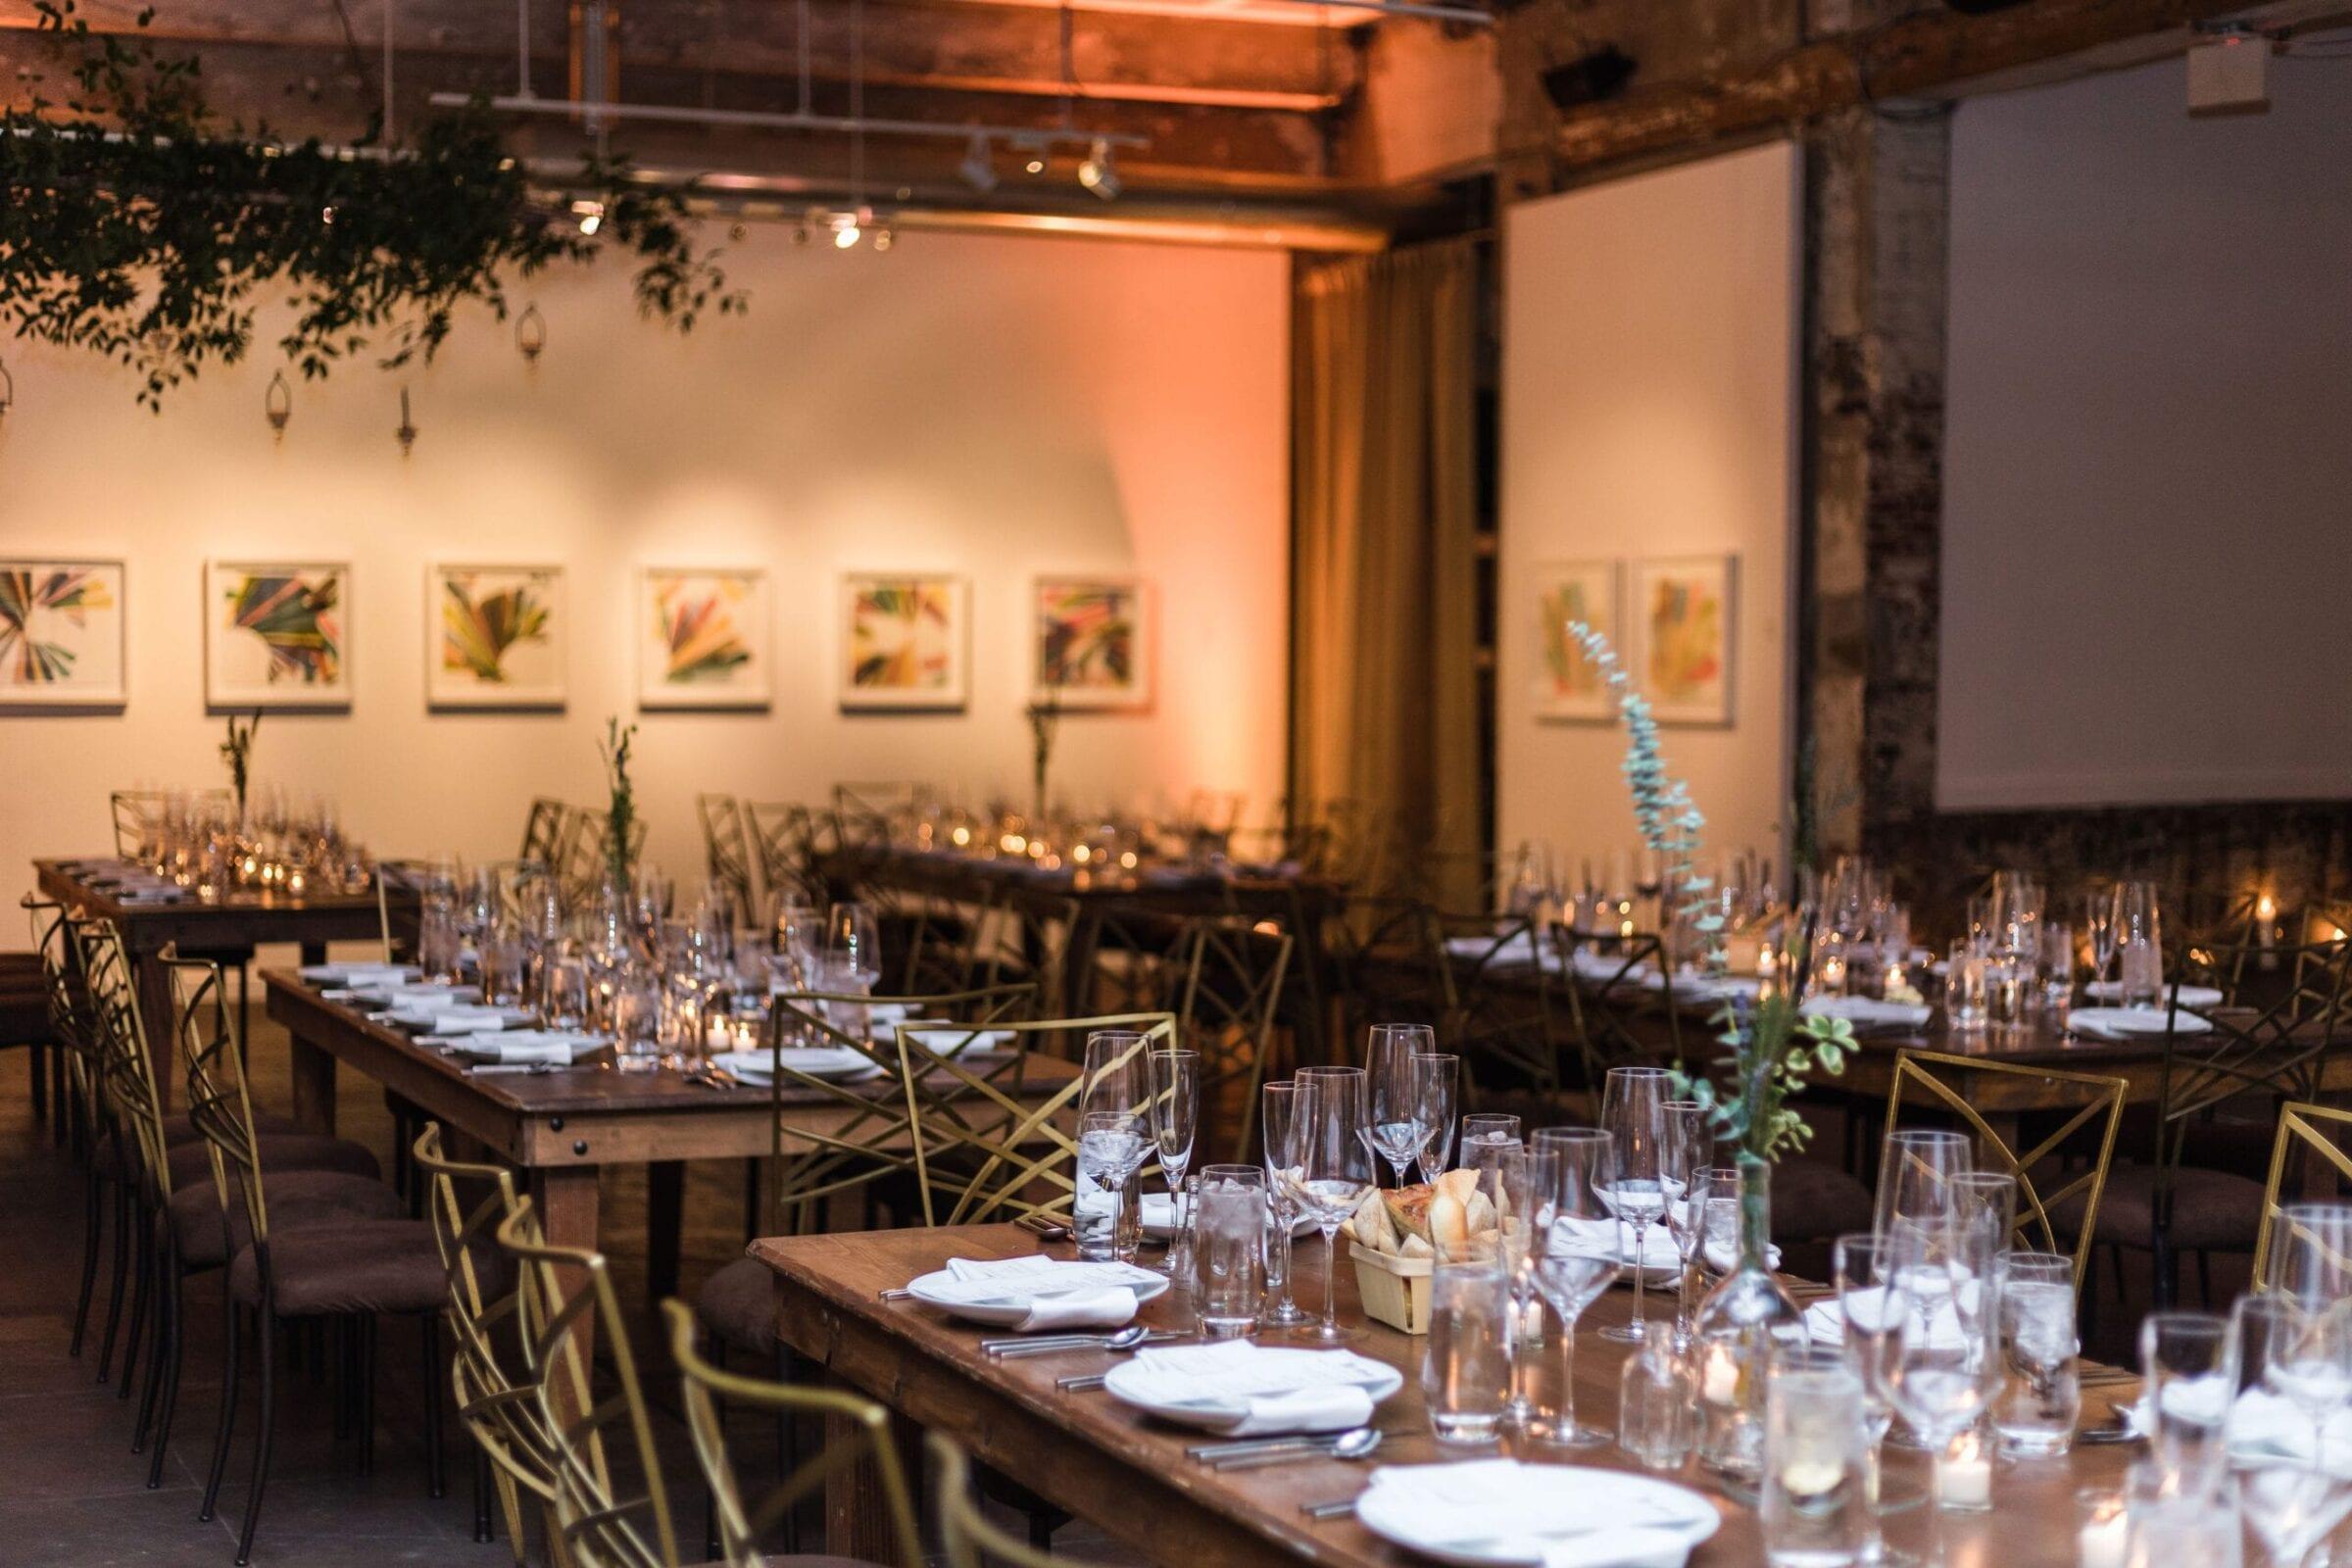 Trish Star Events, professional wedding and event coordination, design, planning worldwide